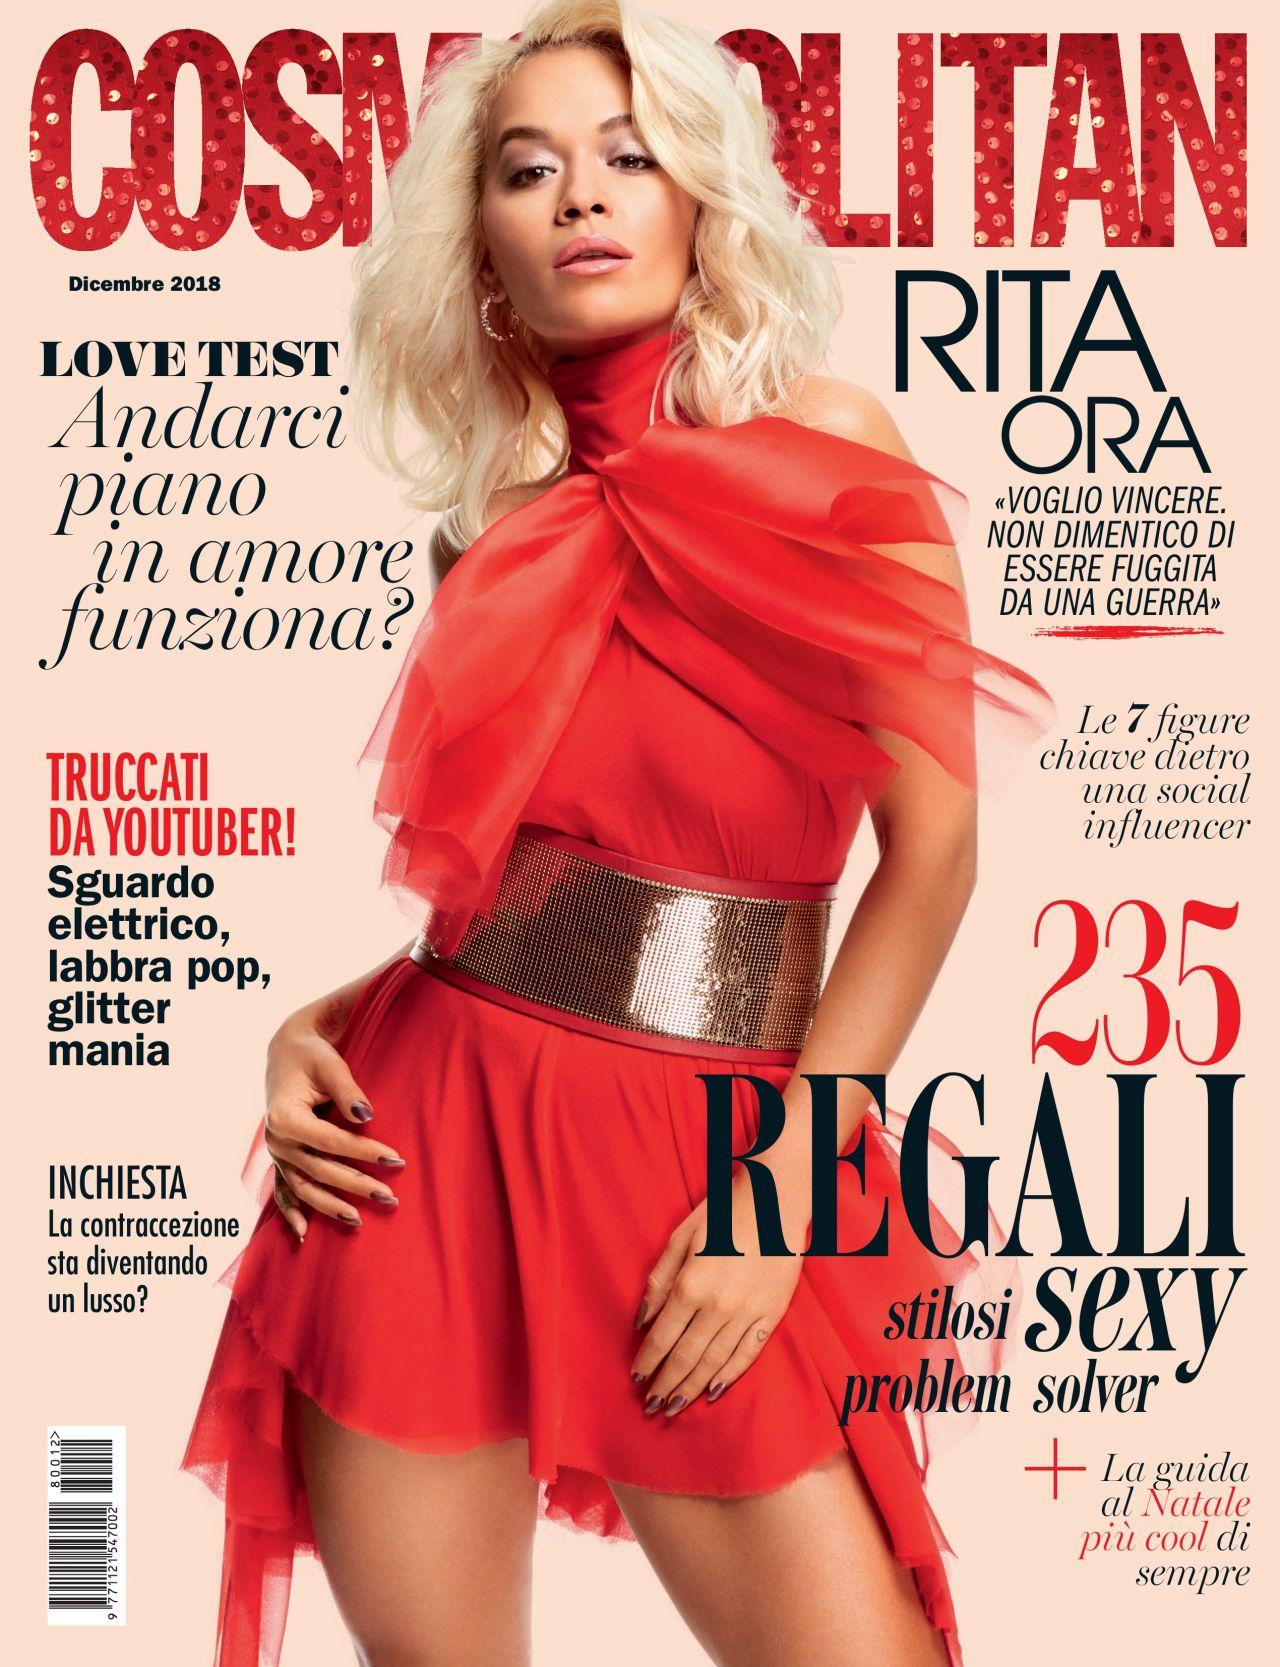 https://celebmafia.com/wp-content/uploads/2018/11/rita-ora-cosmopolitan-italy-december-2018-issue-0.jpg